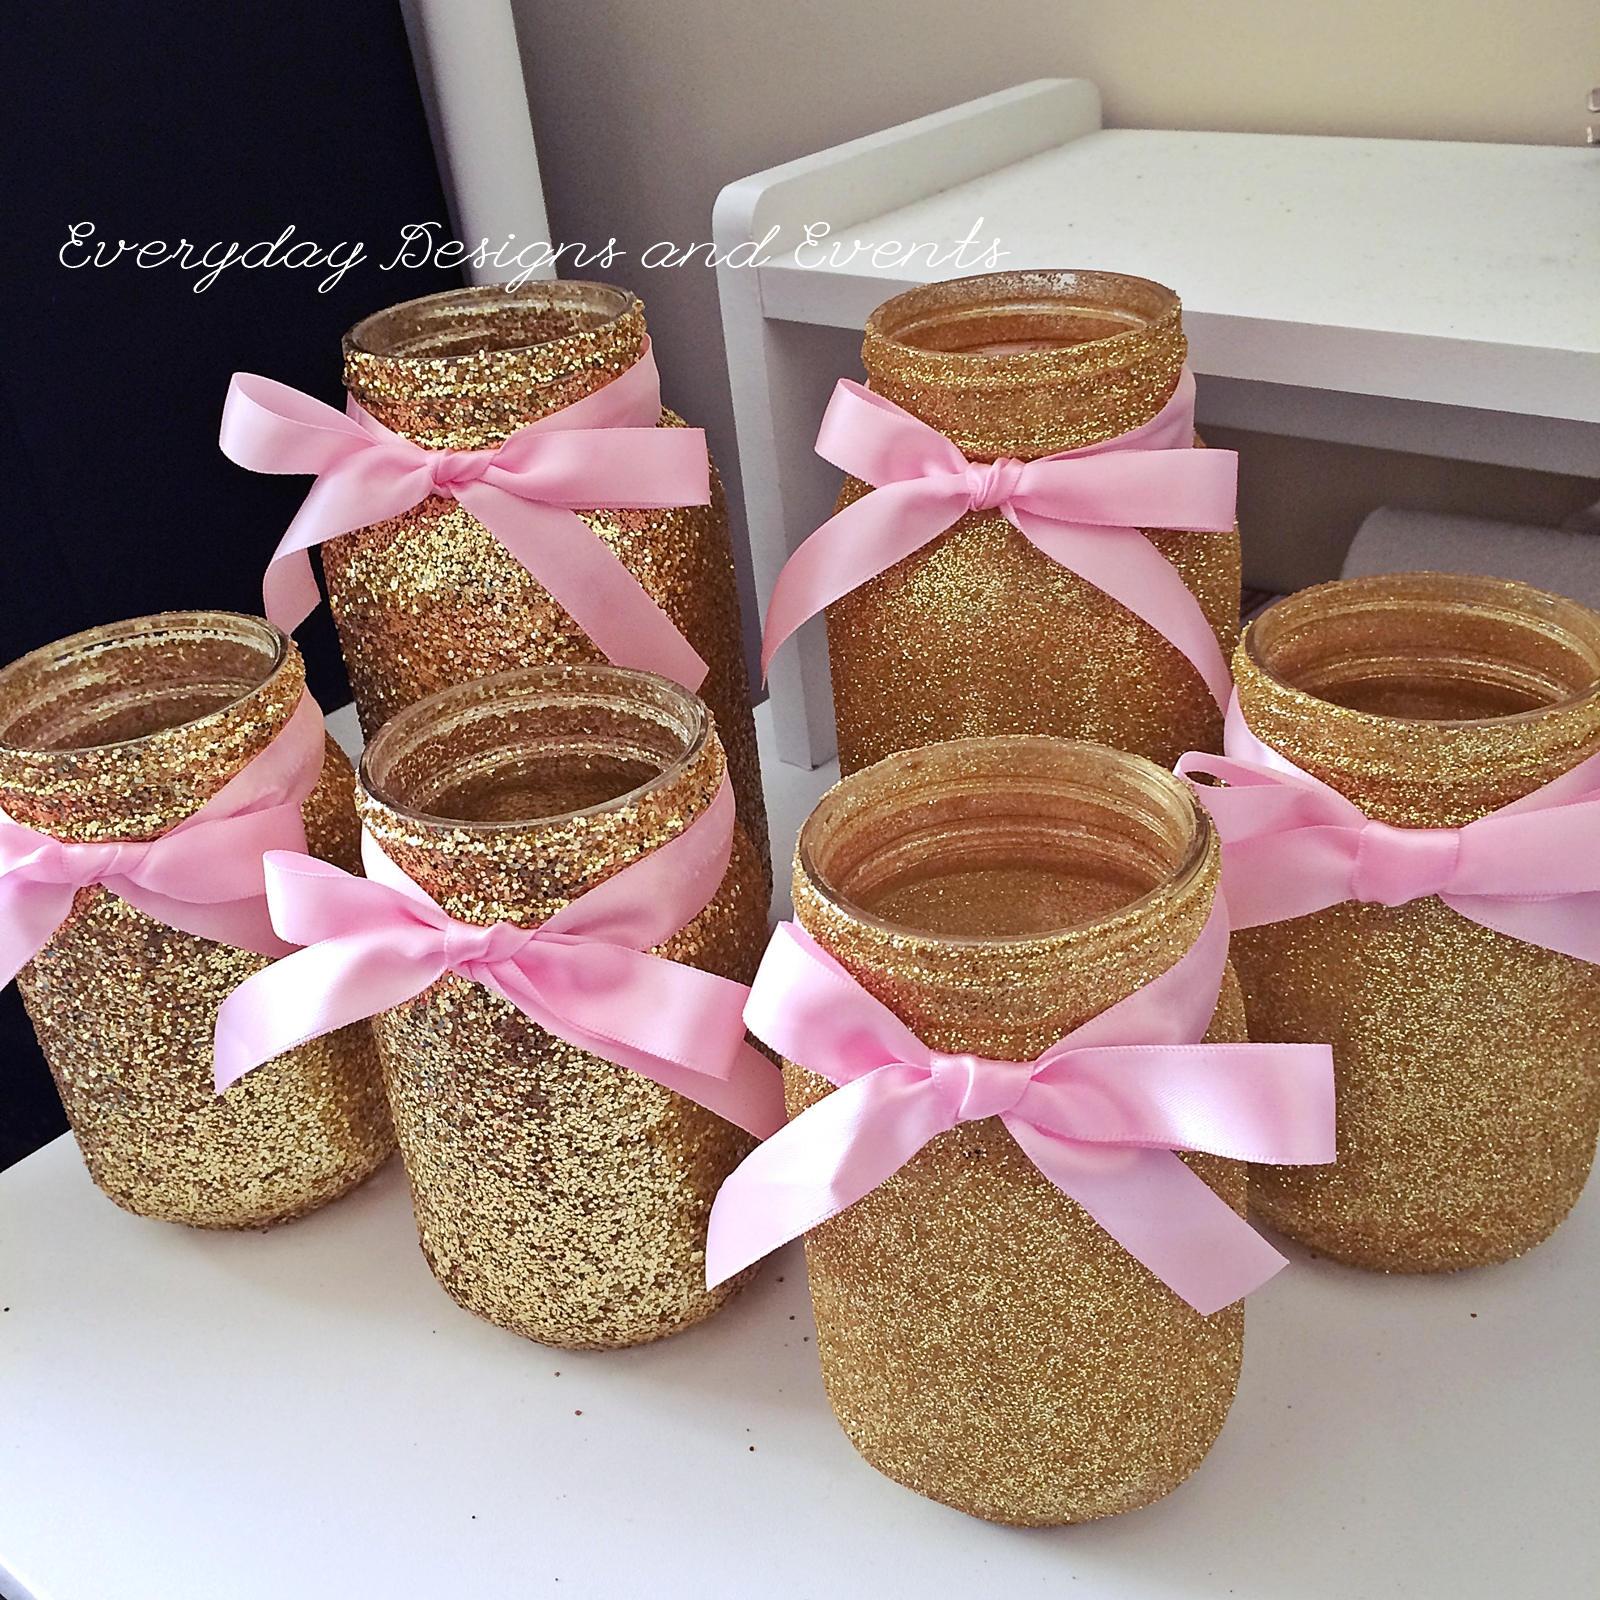 6 Mason Jars Pink Gold, Baby Shower Ideas, Baby Shower Decorations,  Wedding, Wedding Decorations, Wedding Centerpieces, Pink Gold Birthday